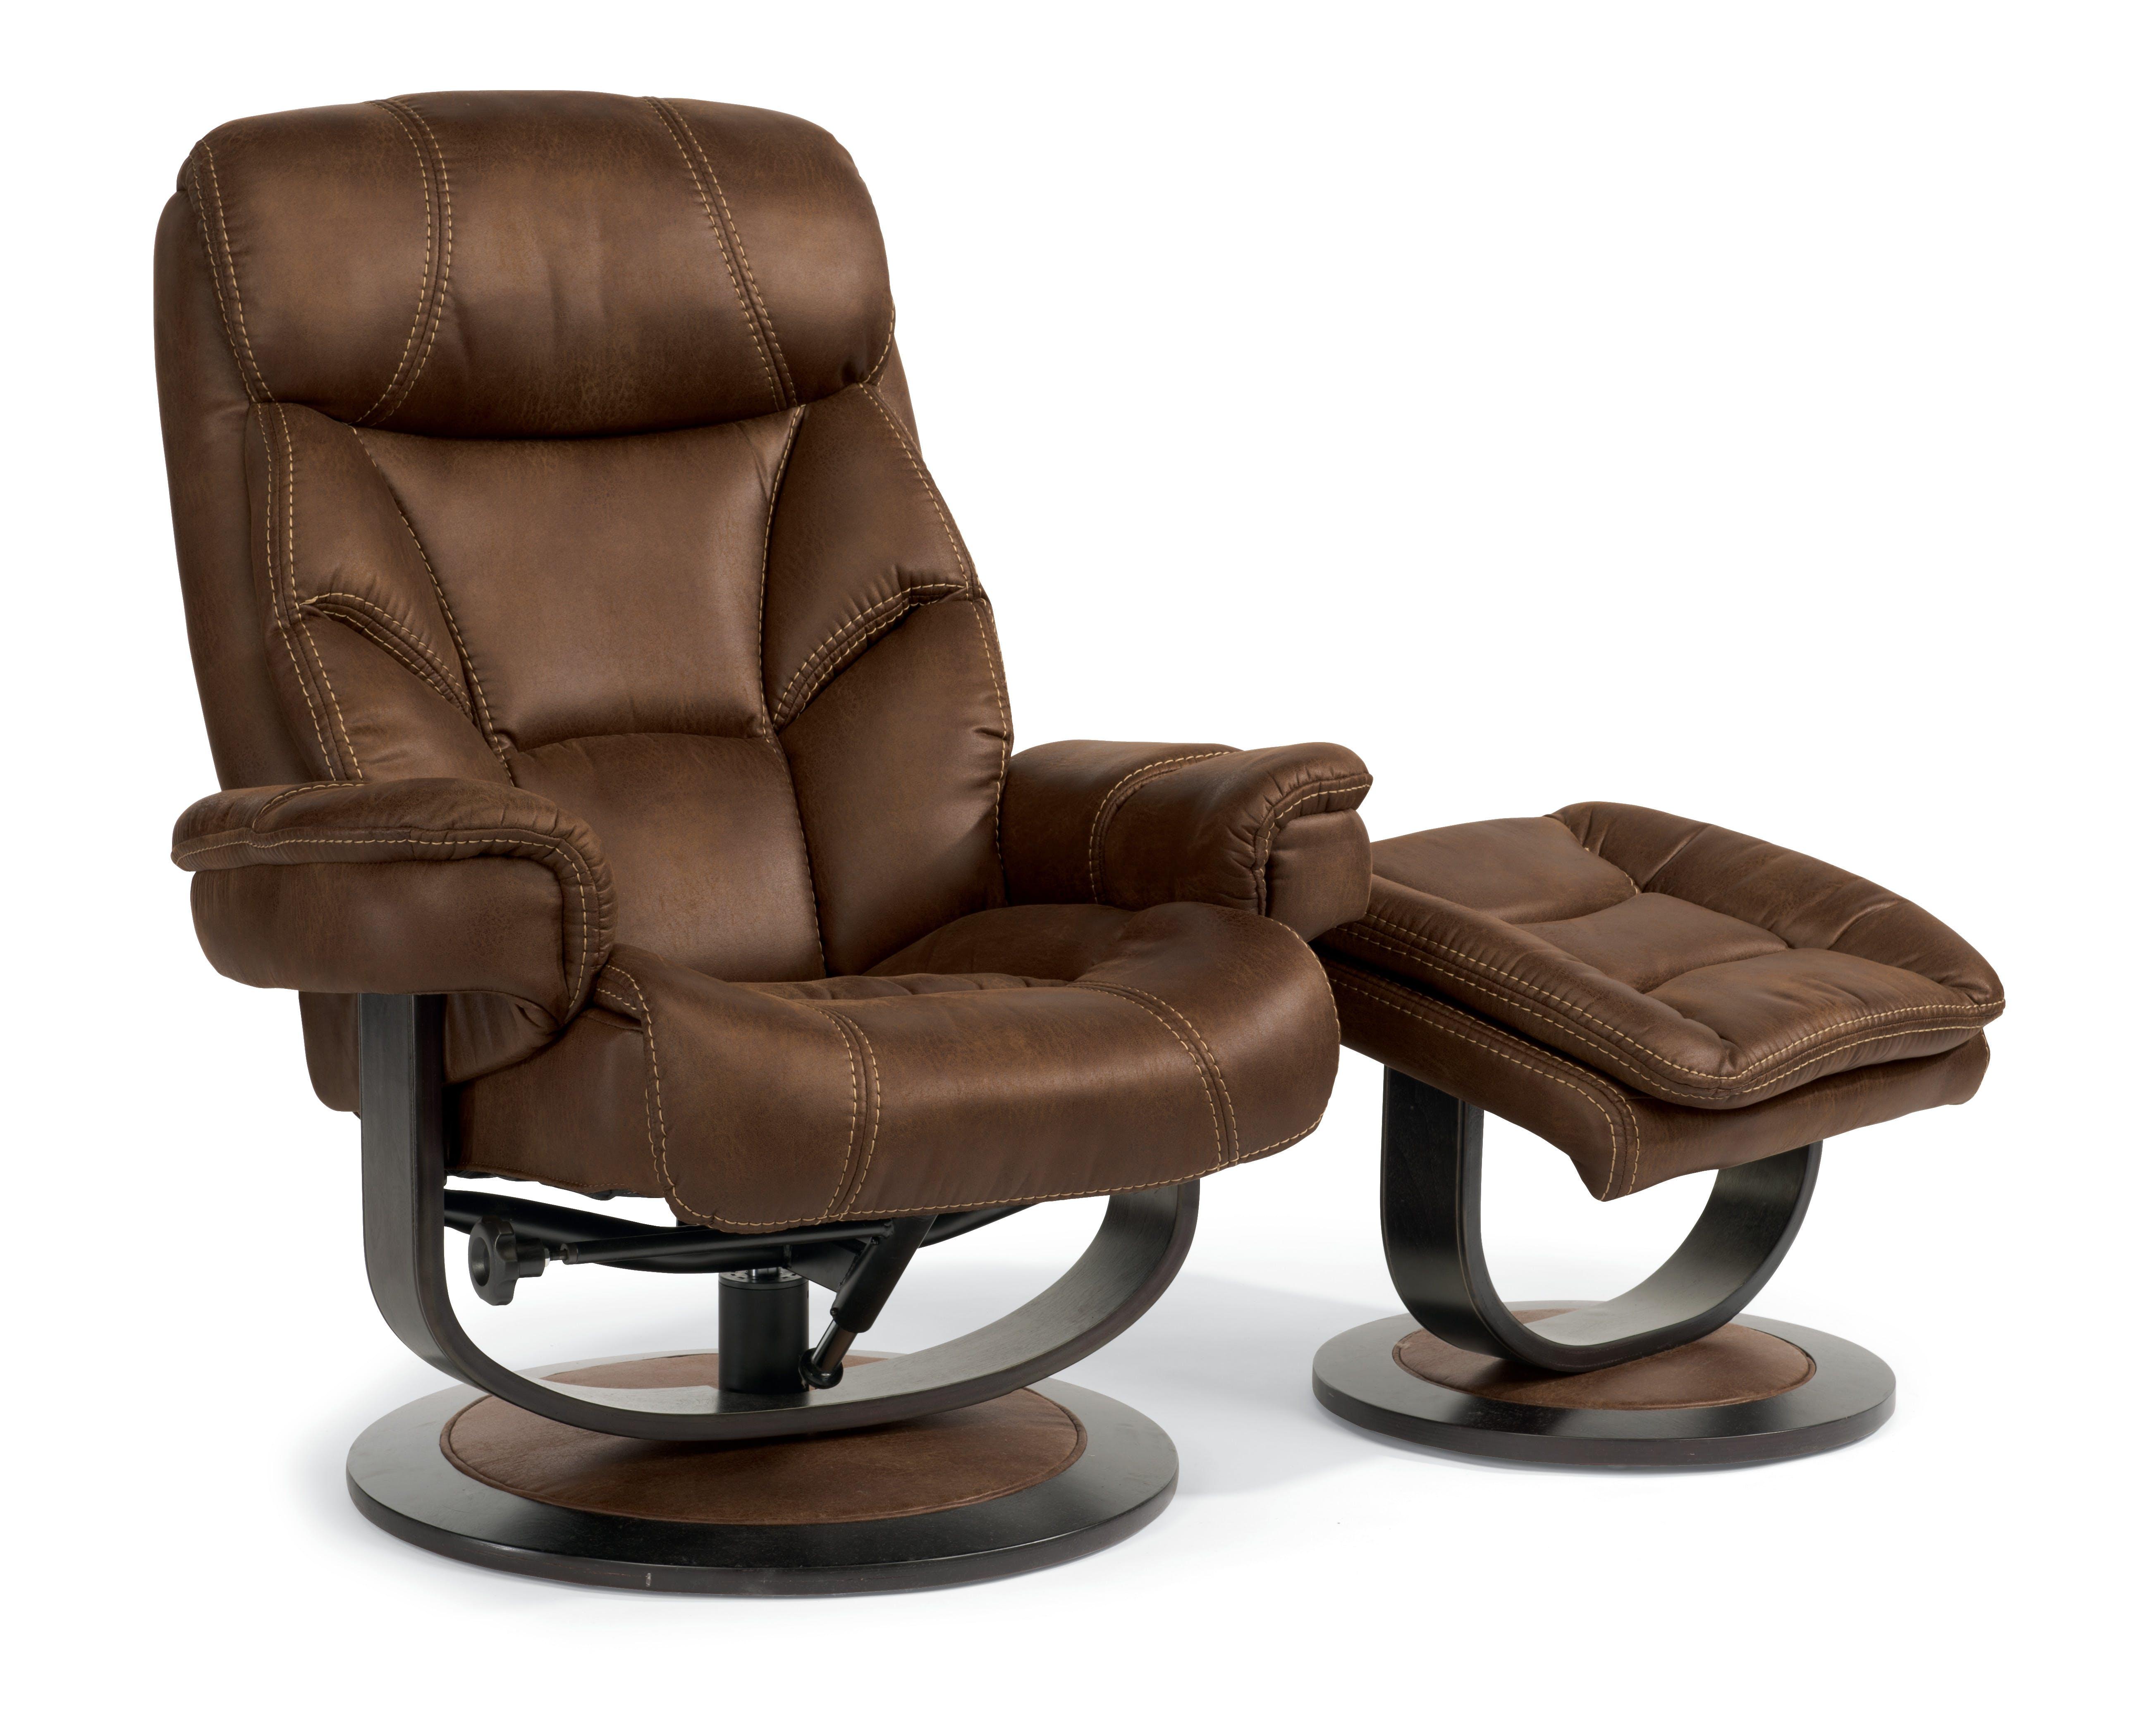 Flexsteel Recliner Chair and Ottoman 456870 - Talsma Furniture